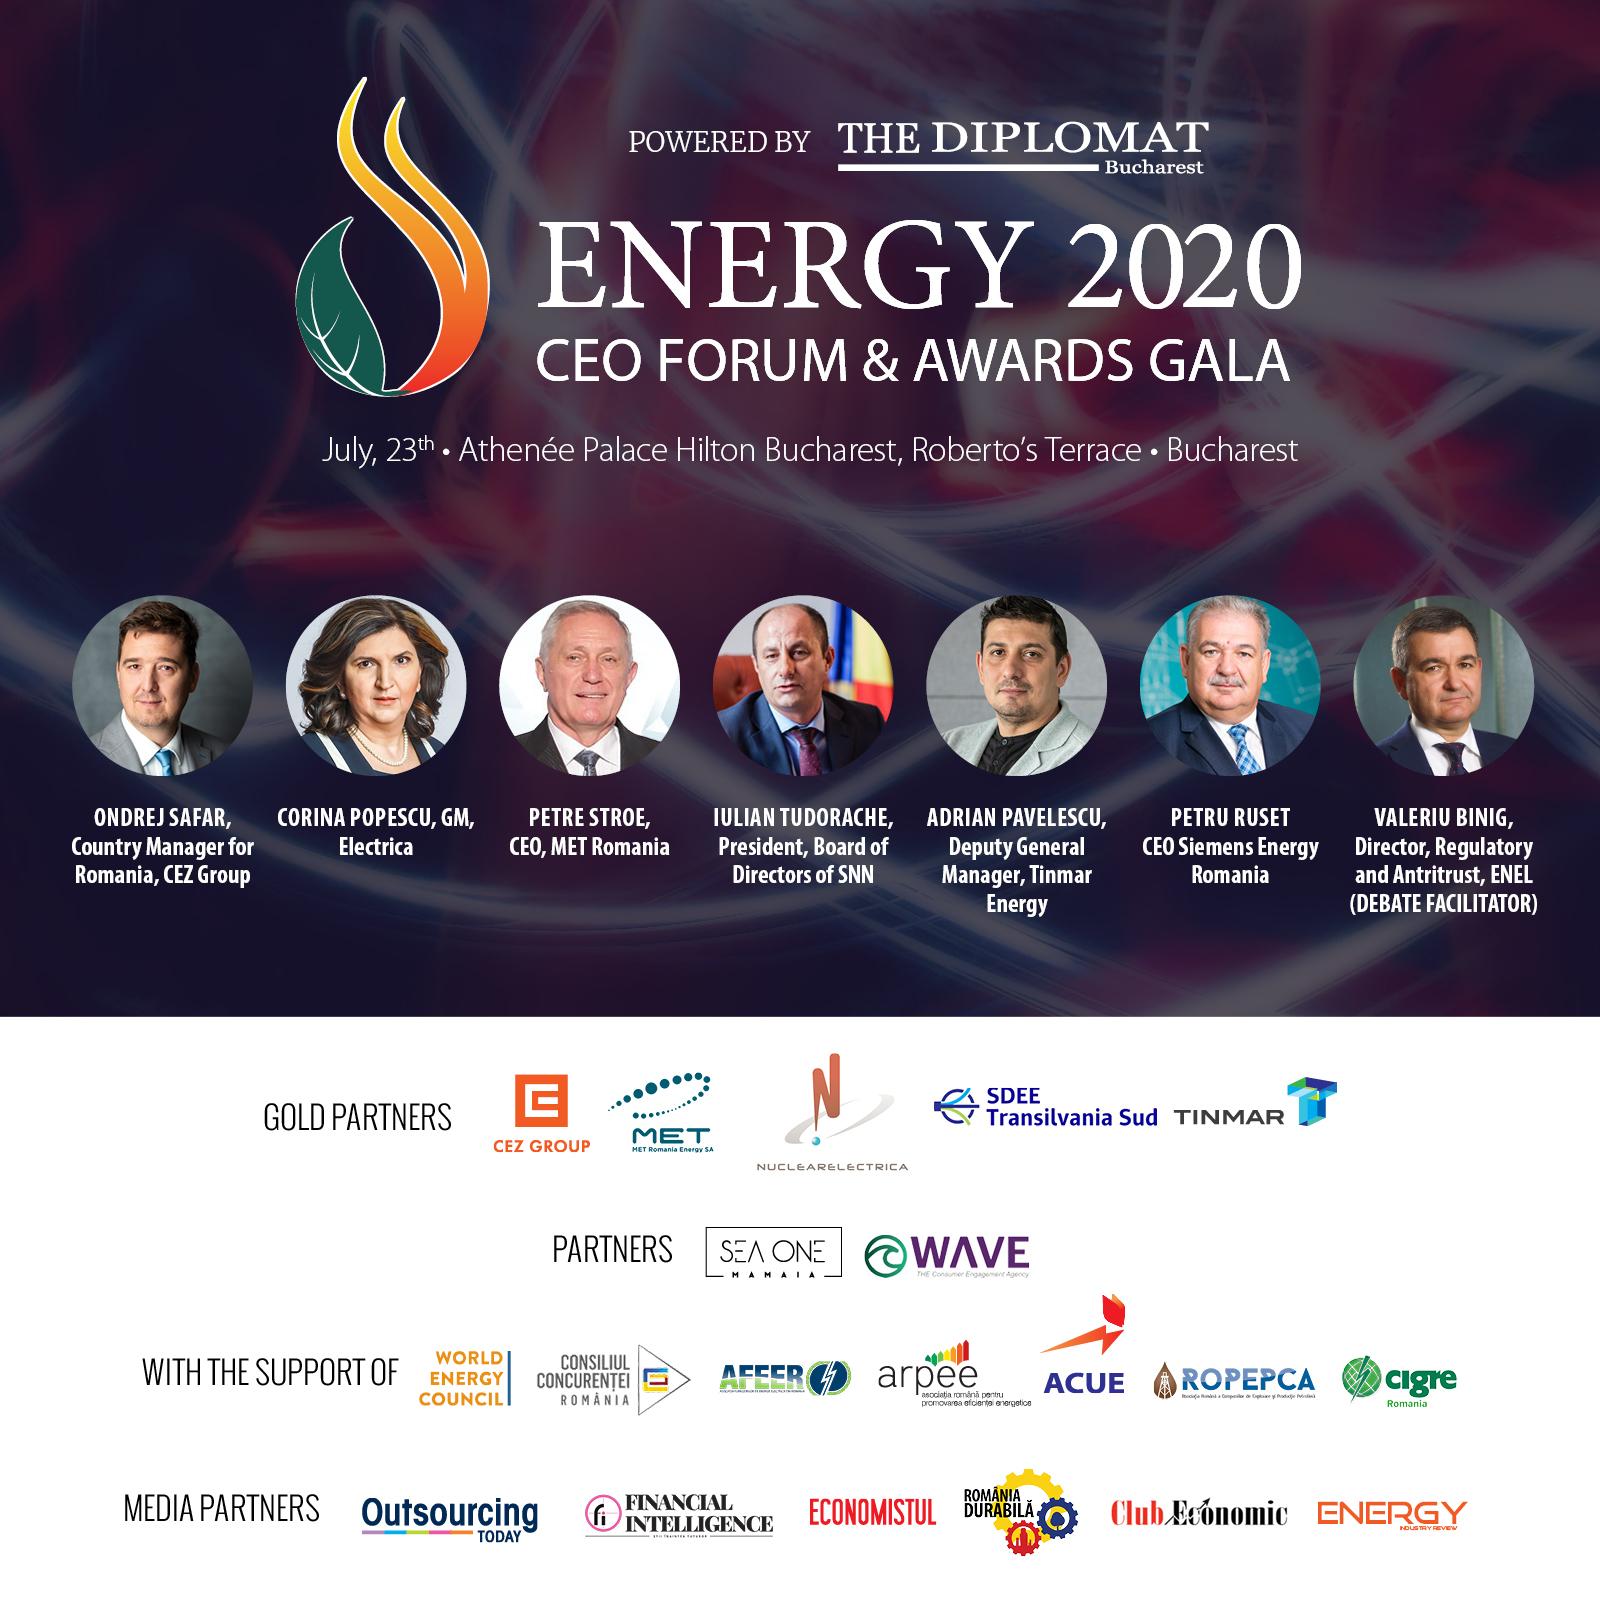 EnergyCEOForumAwards